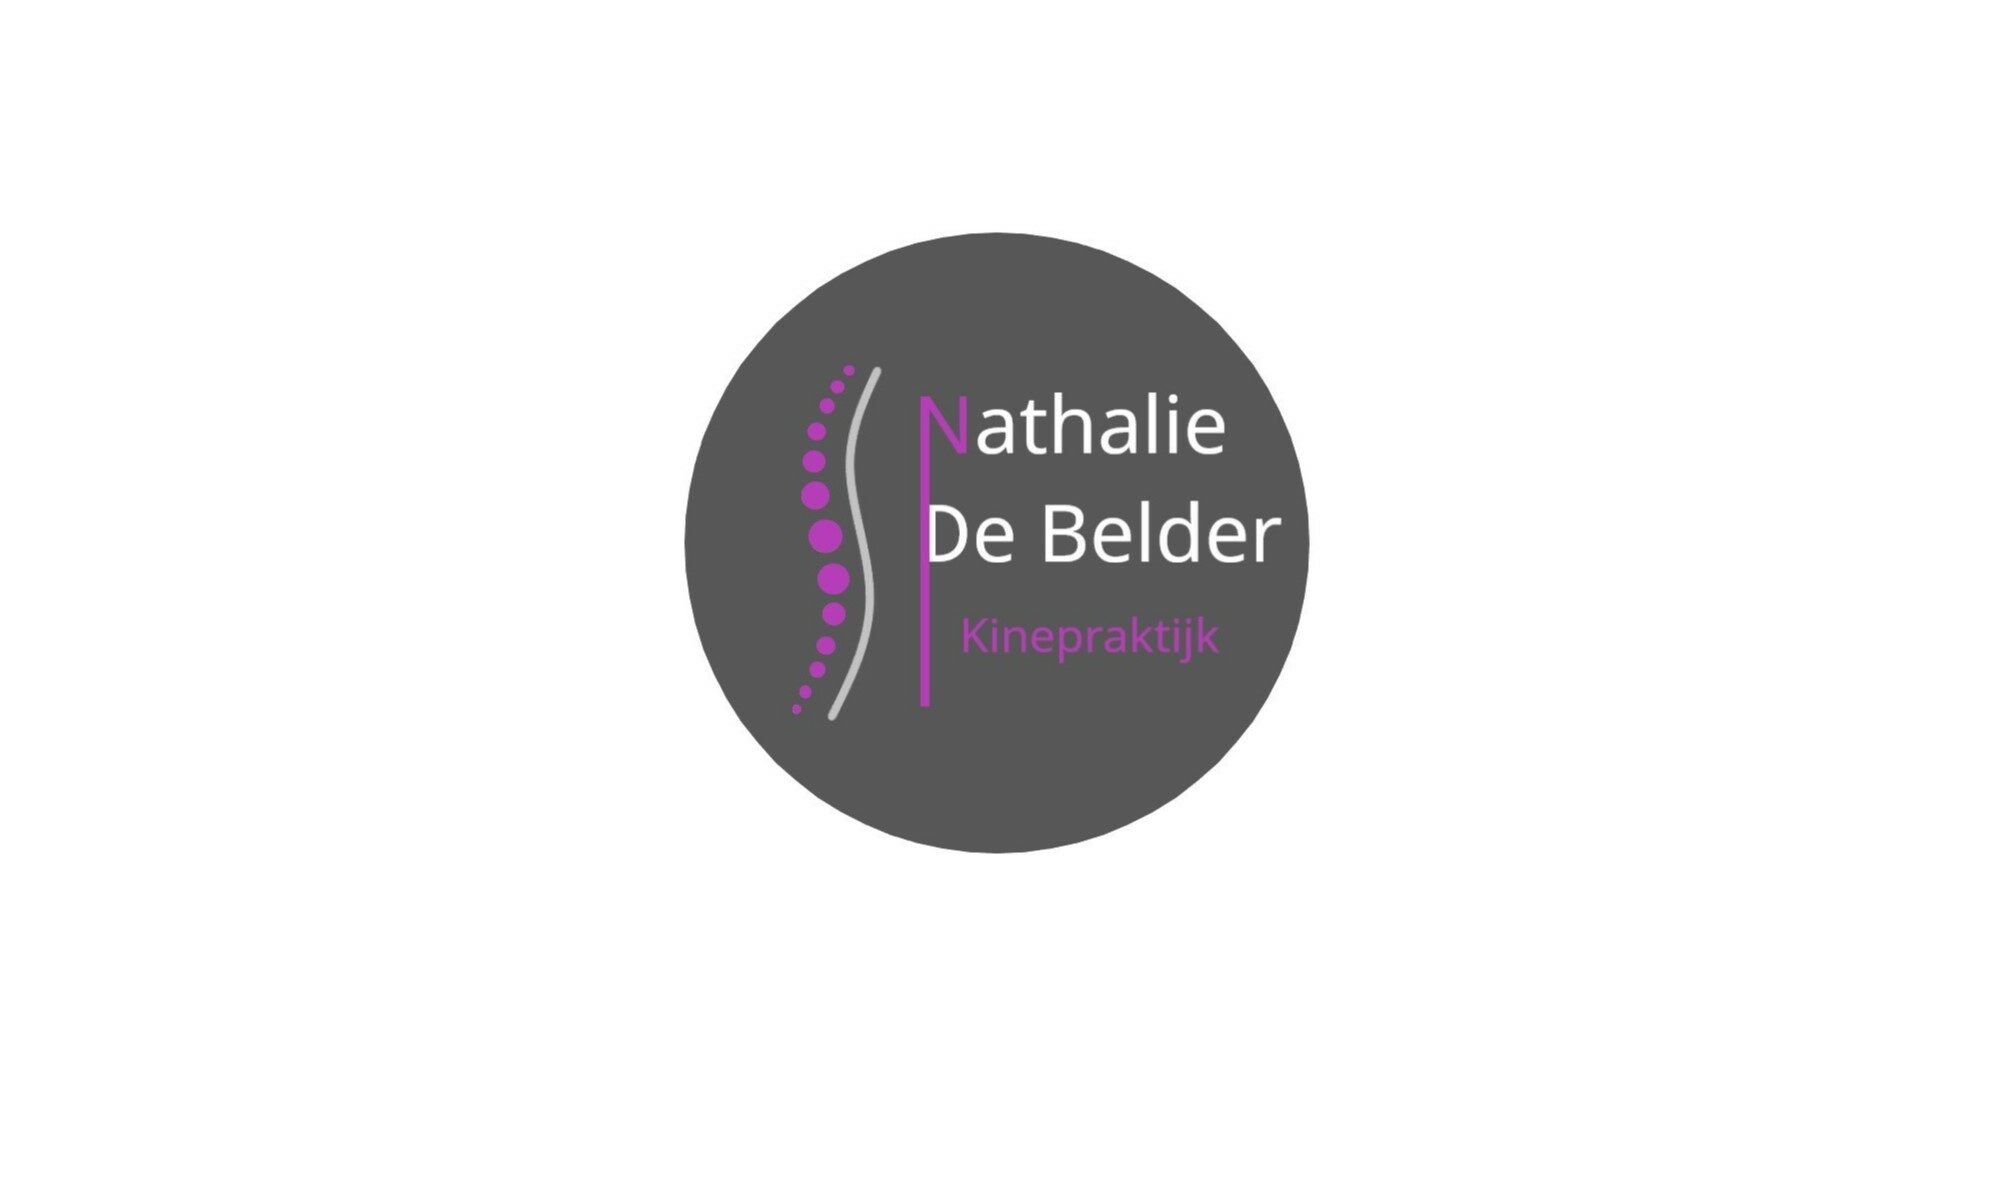 Kinepraktijk Nathalie De Belder